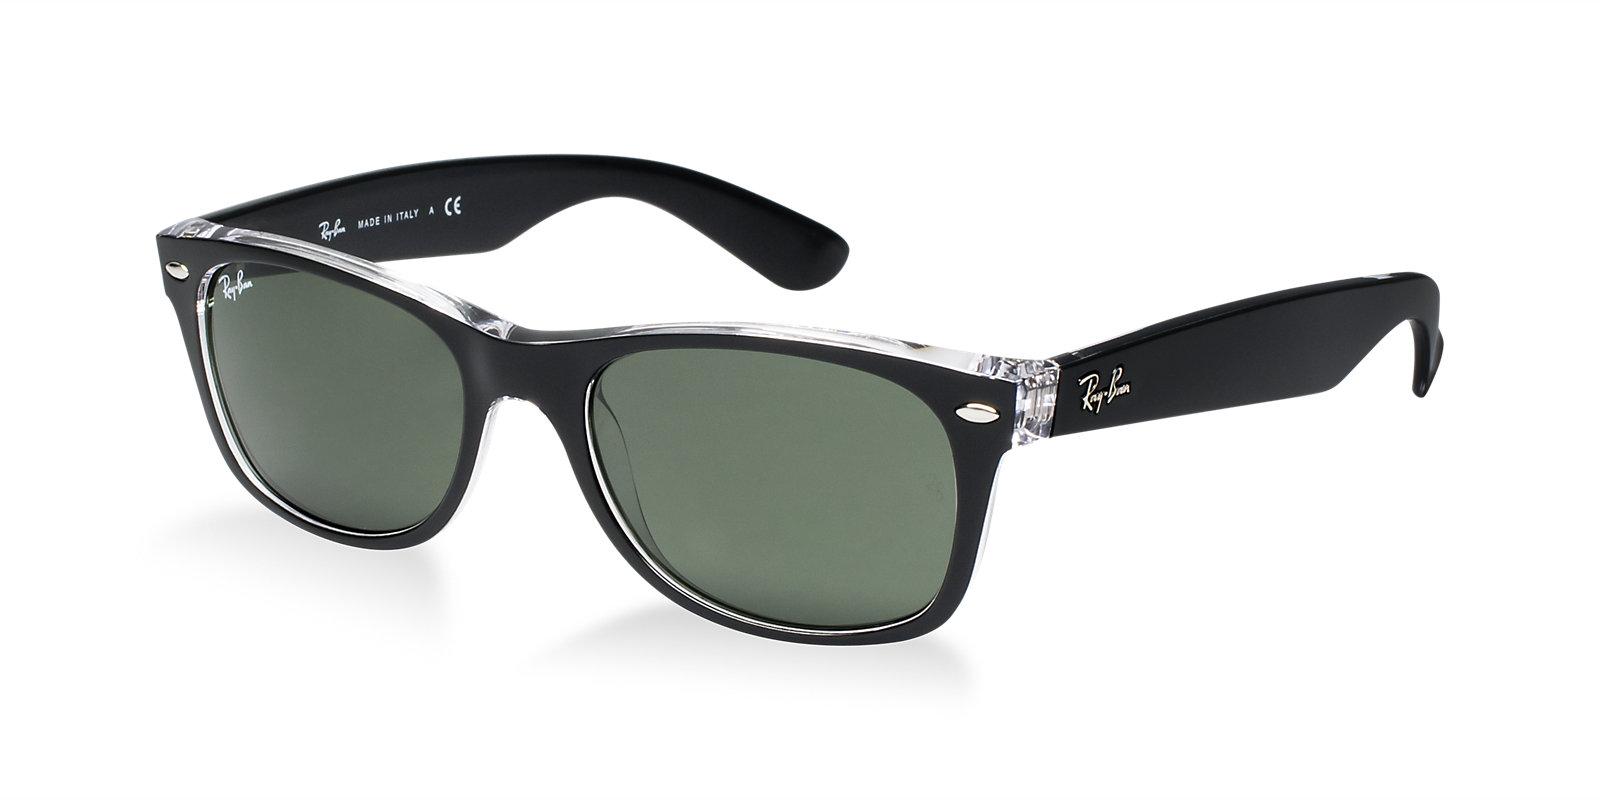 ray ban rb2132 6052 new wayfarer sunglasses lux eyewear. Black Bedroom Furniture Sets. Home Design Ideas